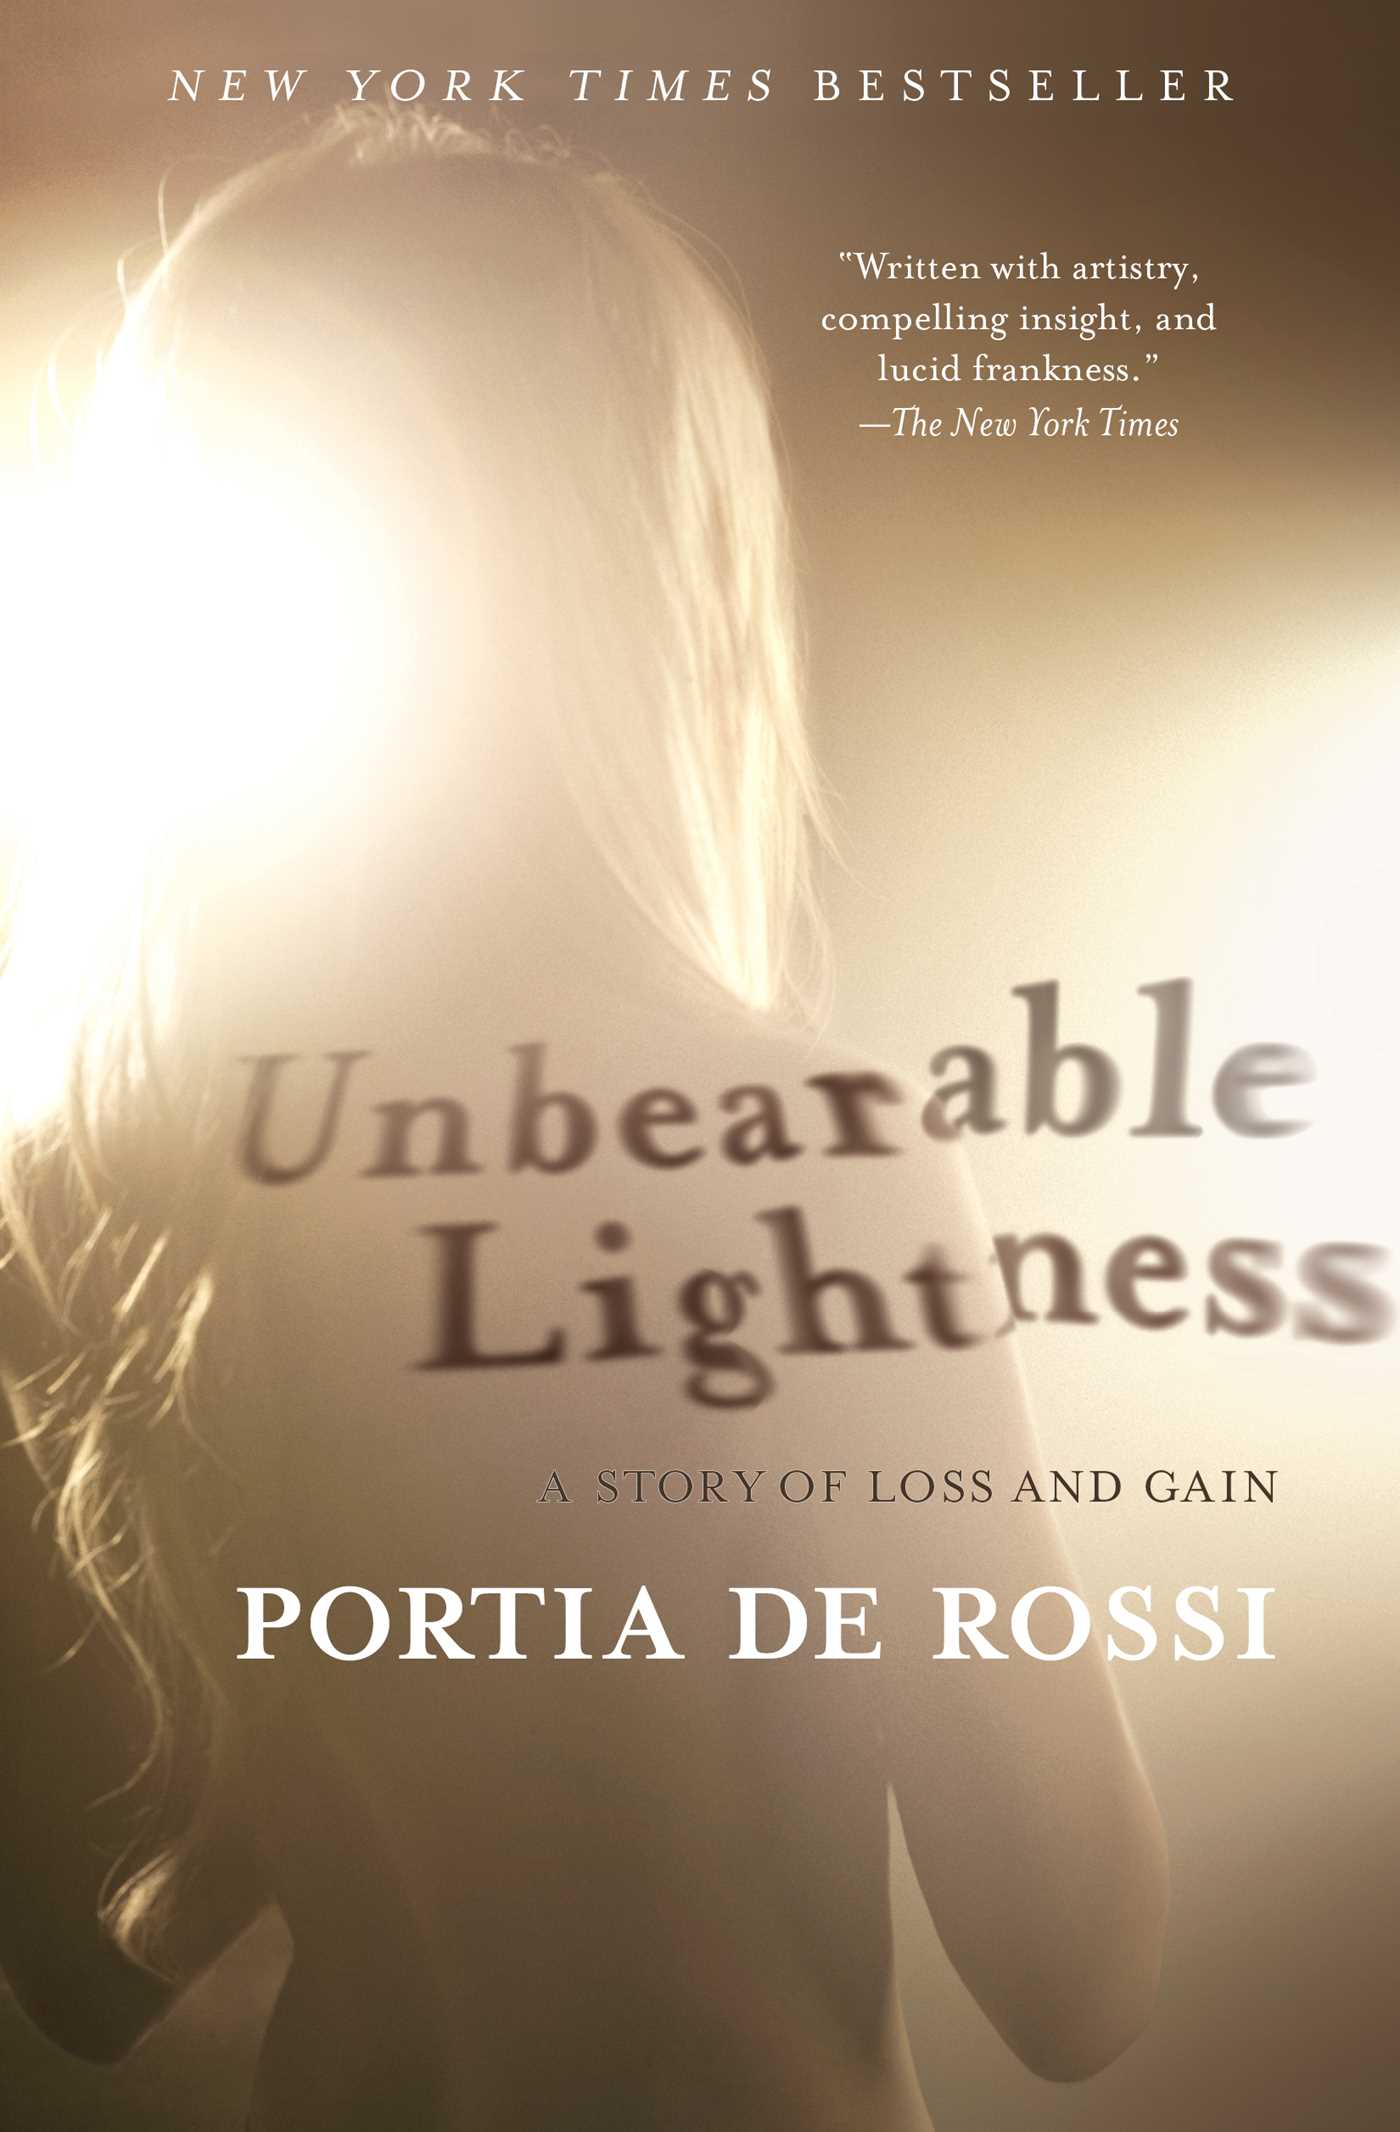 Unbearable lightness 9781439177792 hr